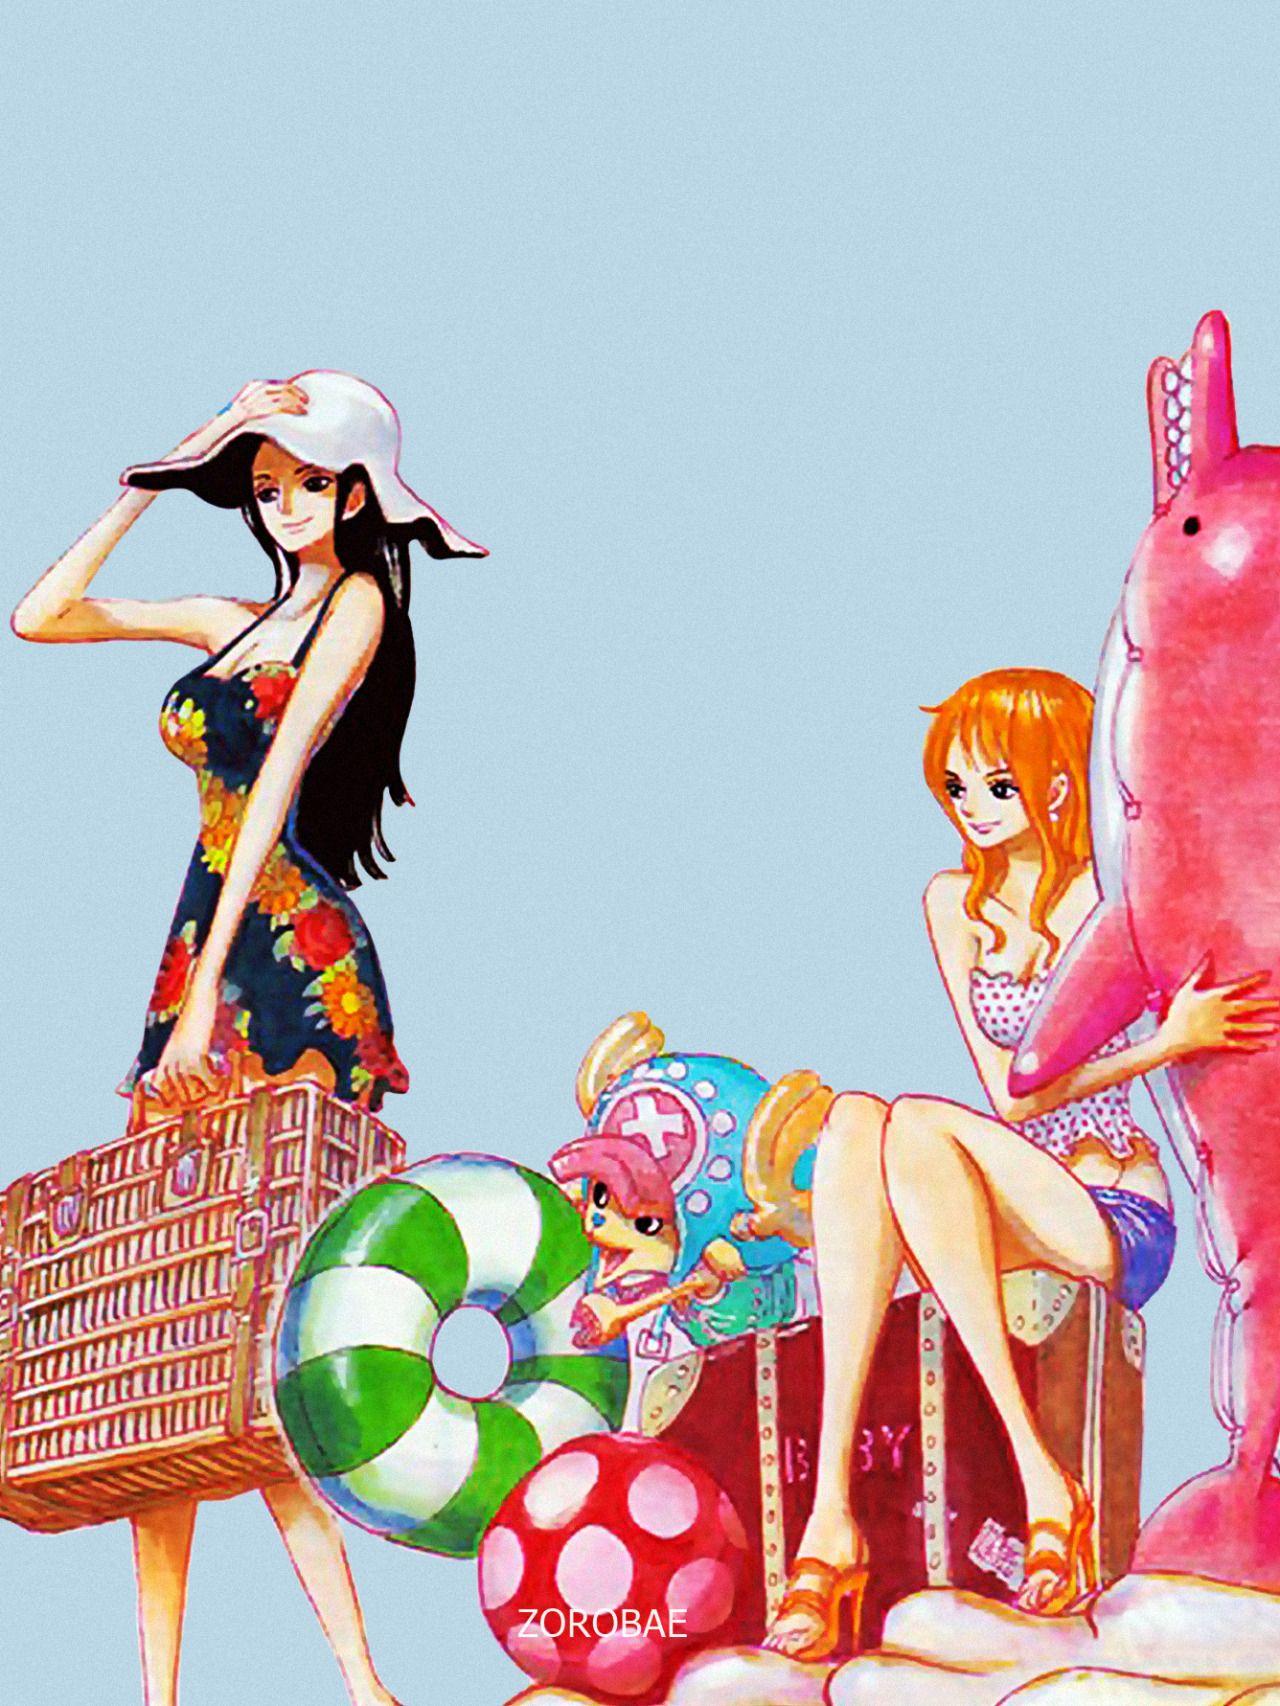 Zoro understands Luffy. | One piece nami, One piece manga